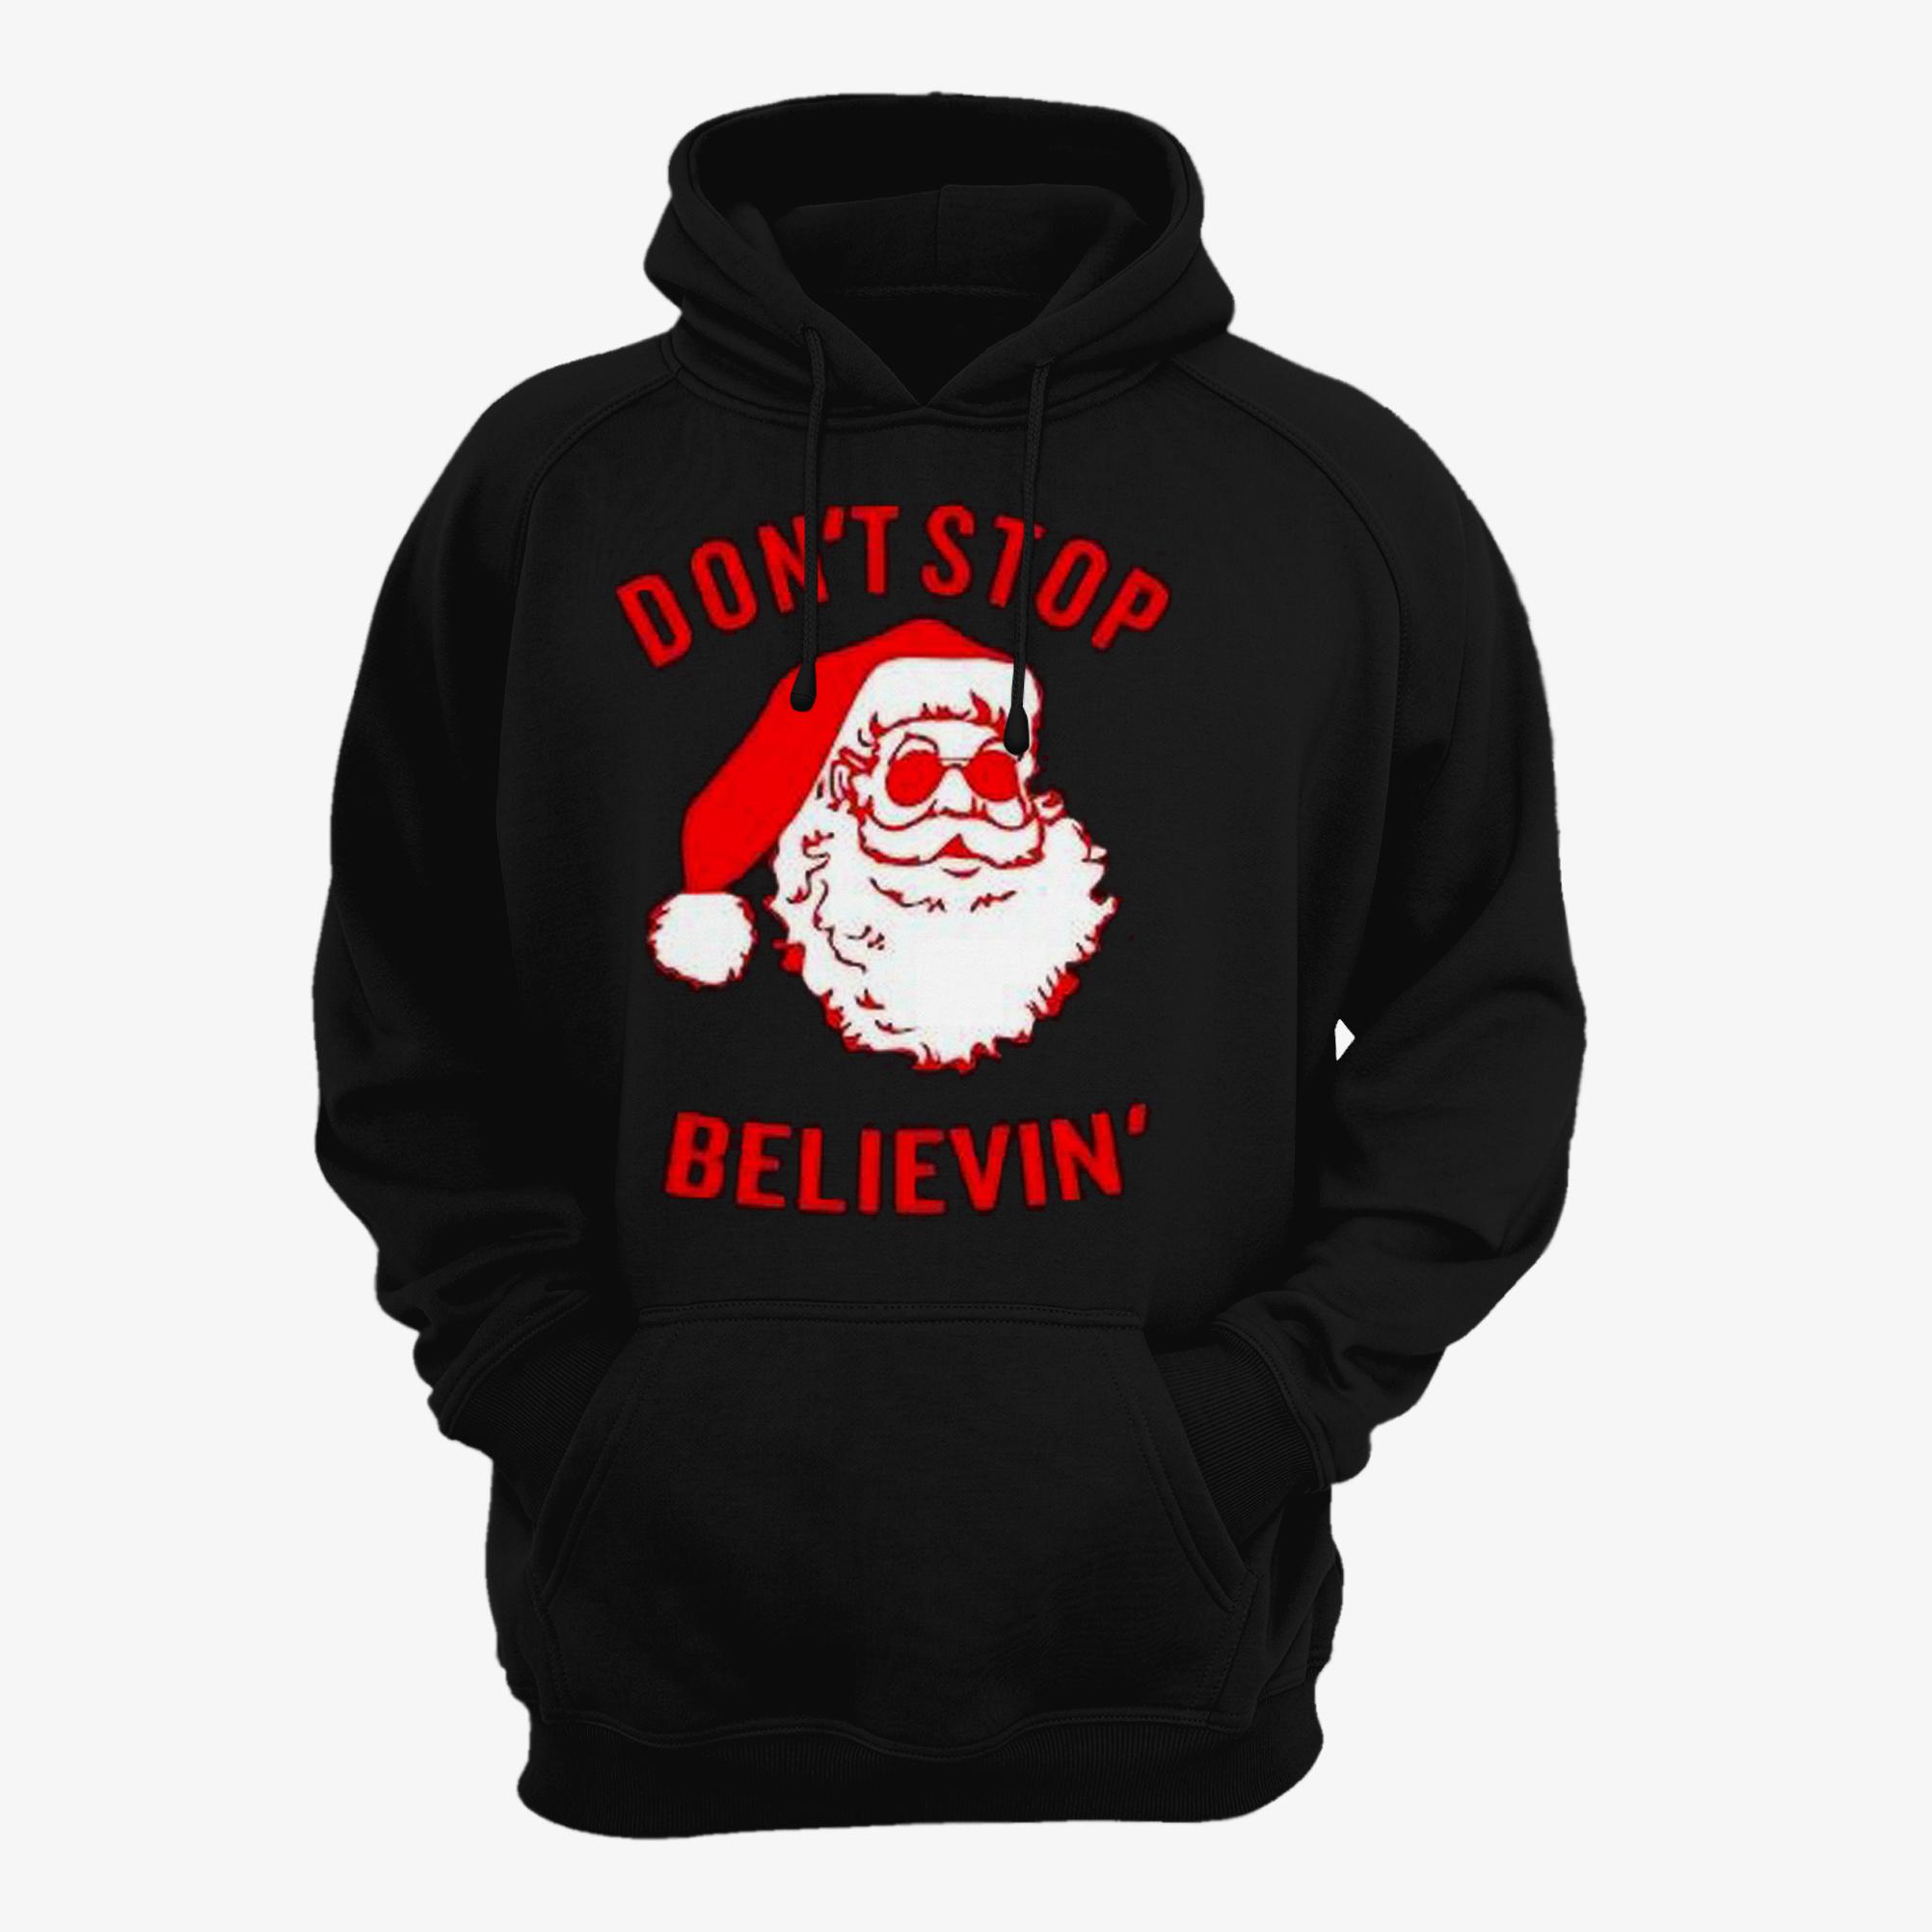 Don't Stop Santa Claus Believin Merry Christmas Hoodie